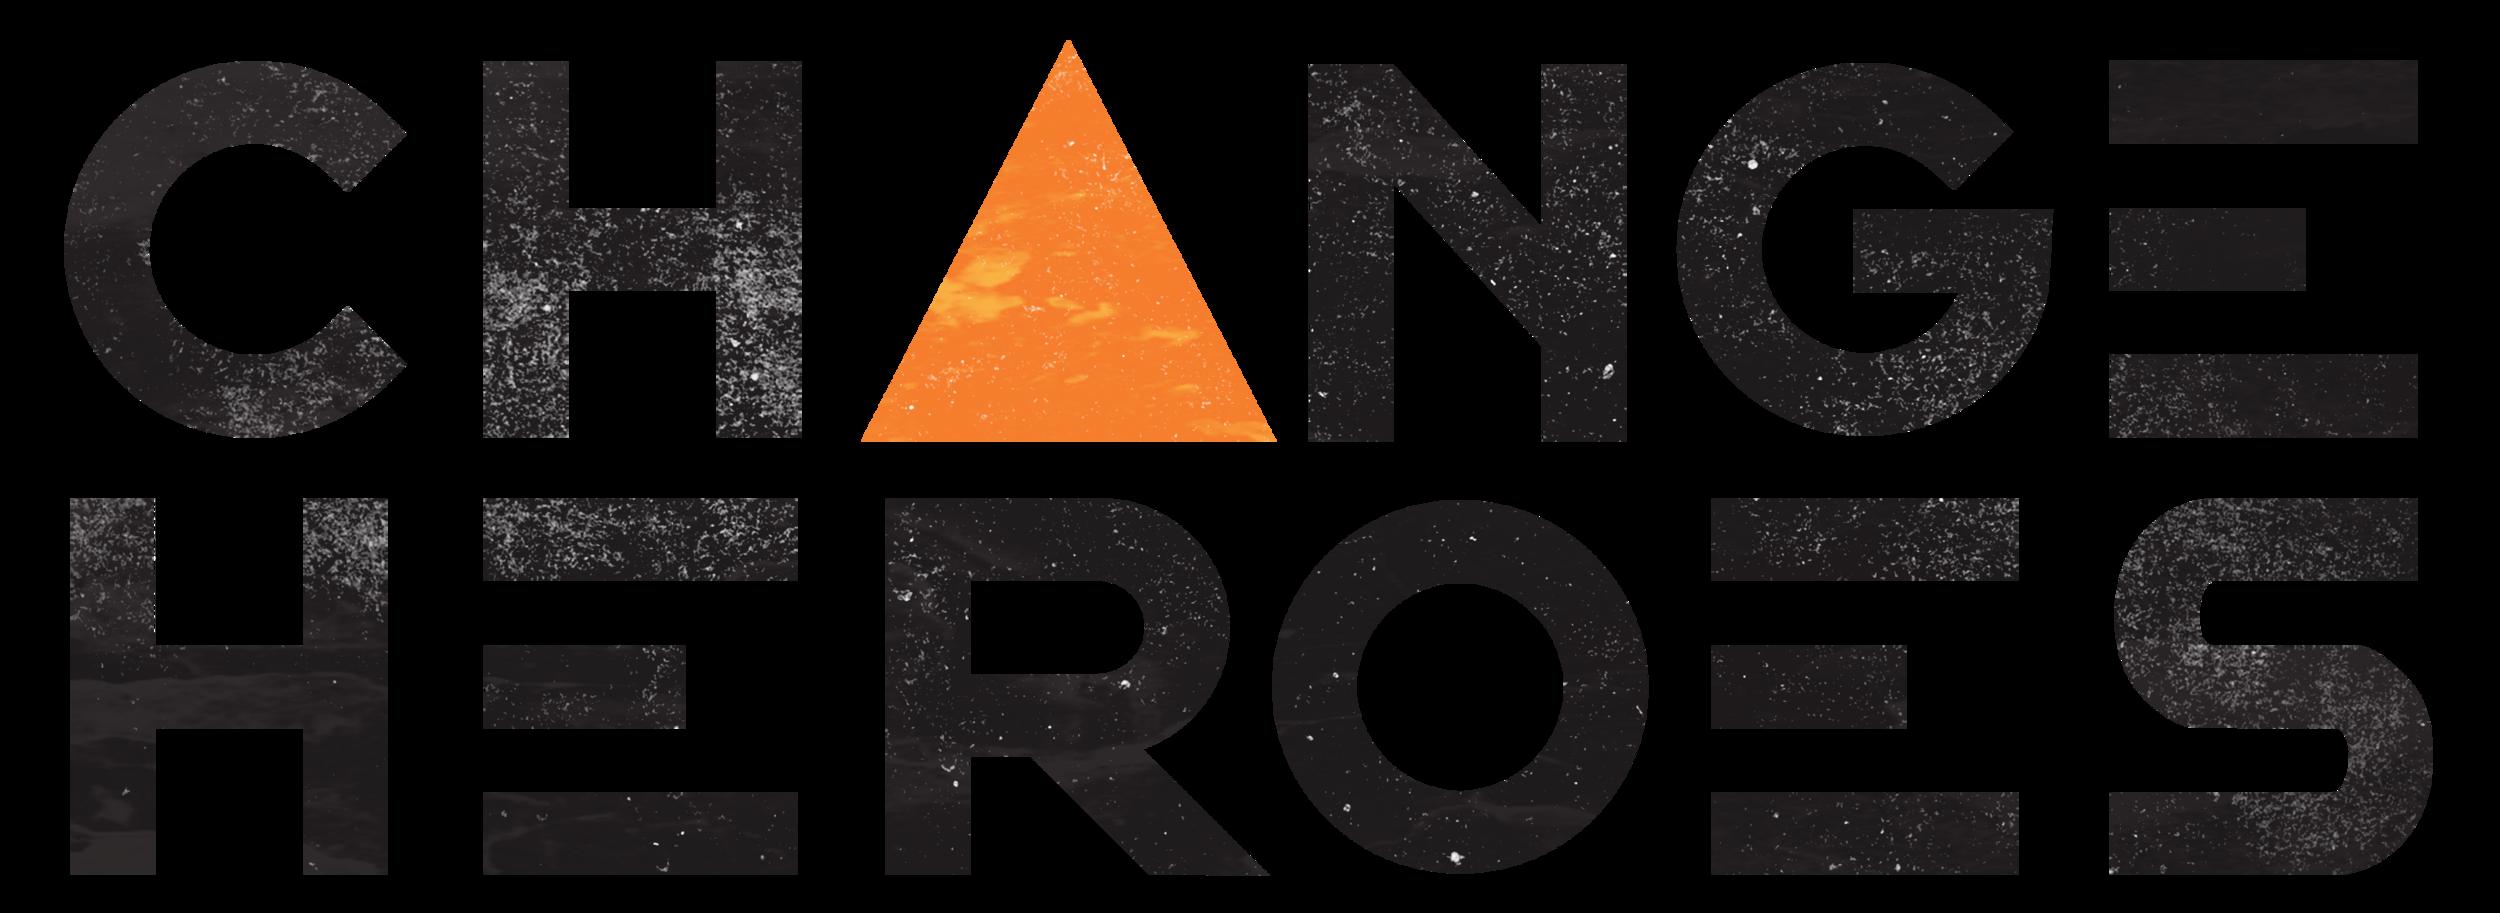 change heroes logo.png